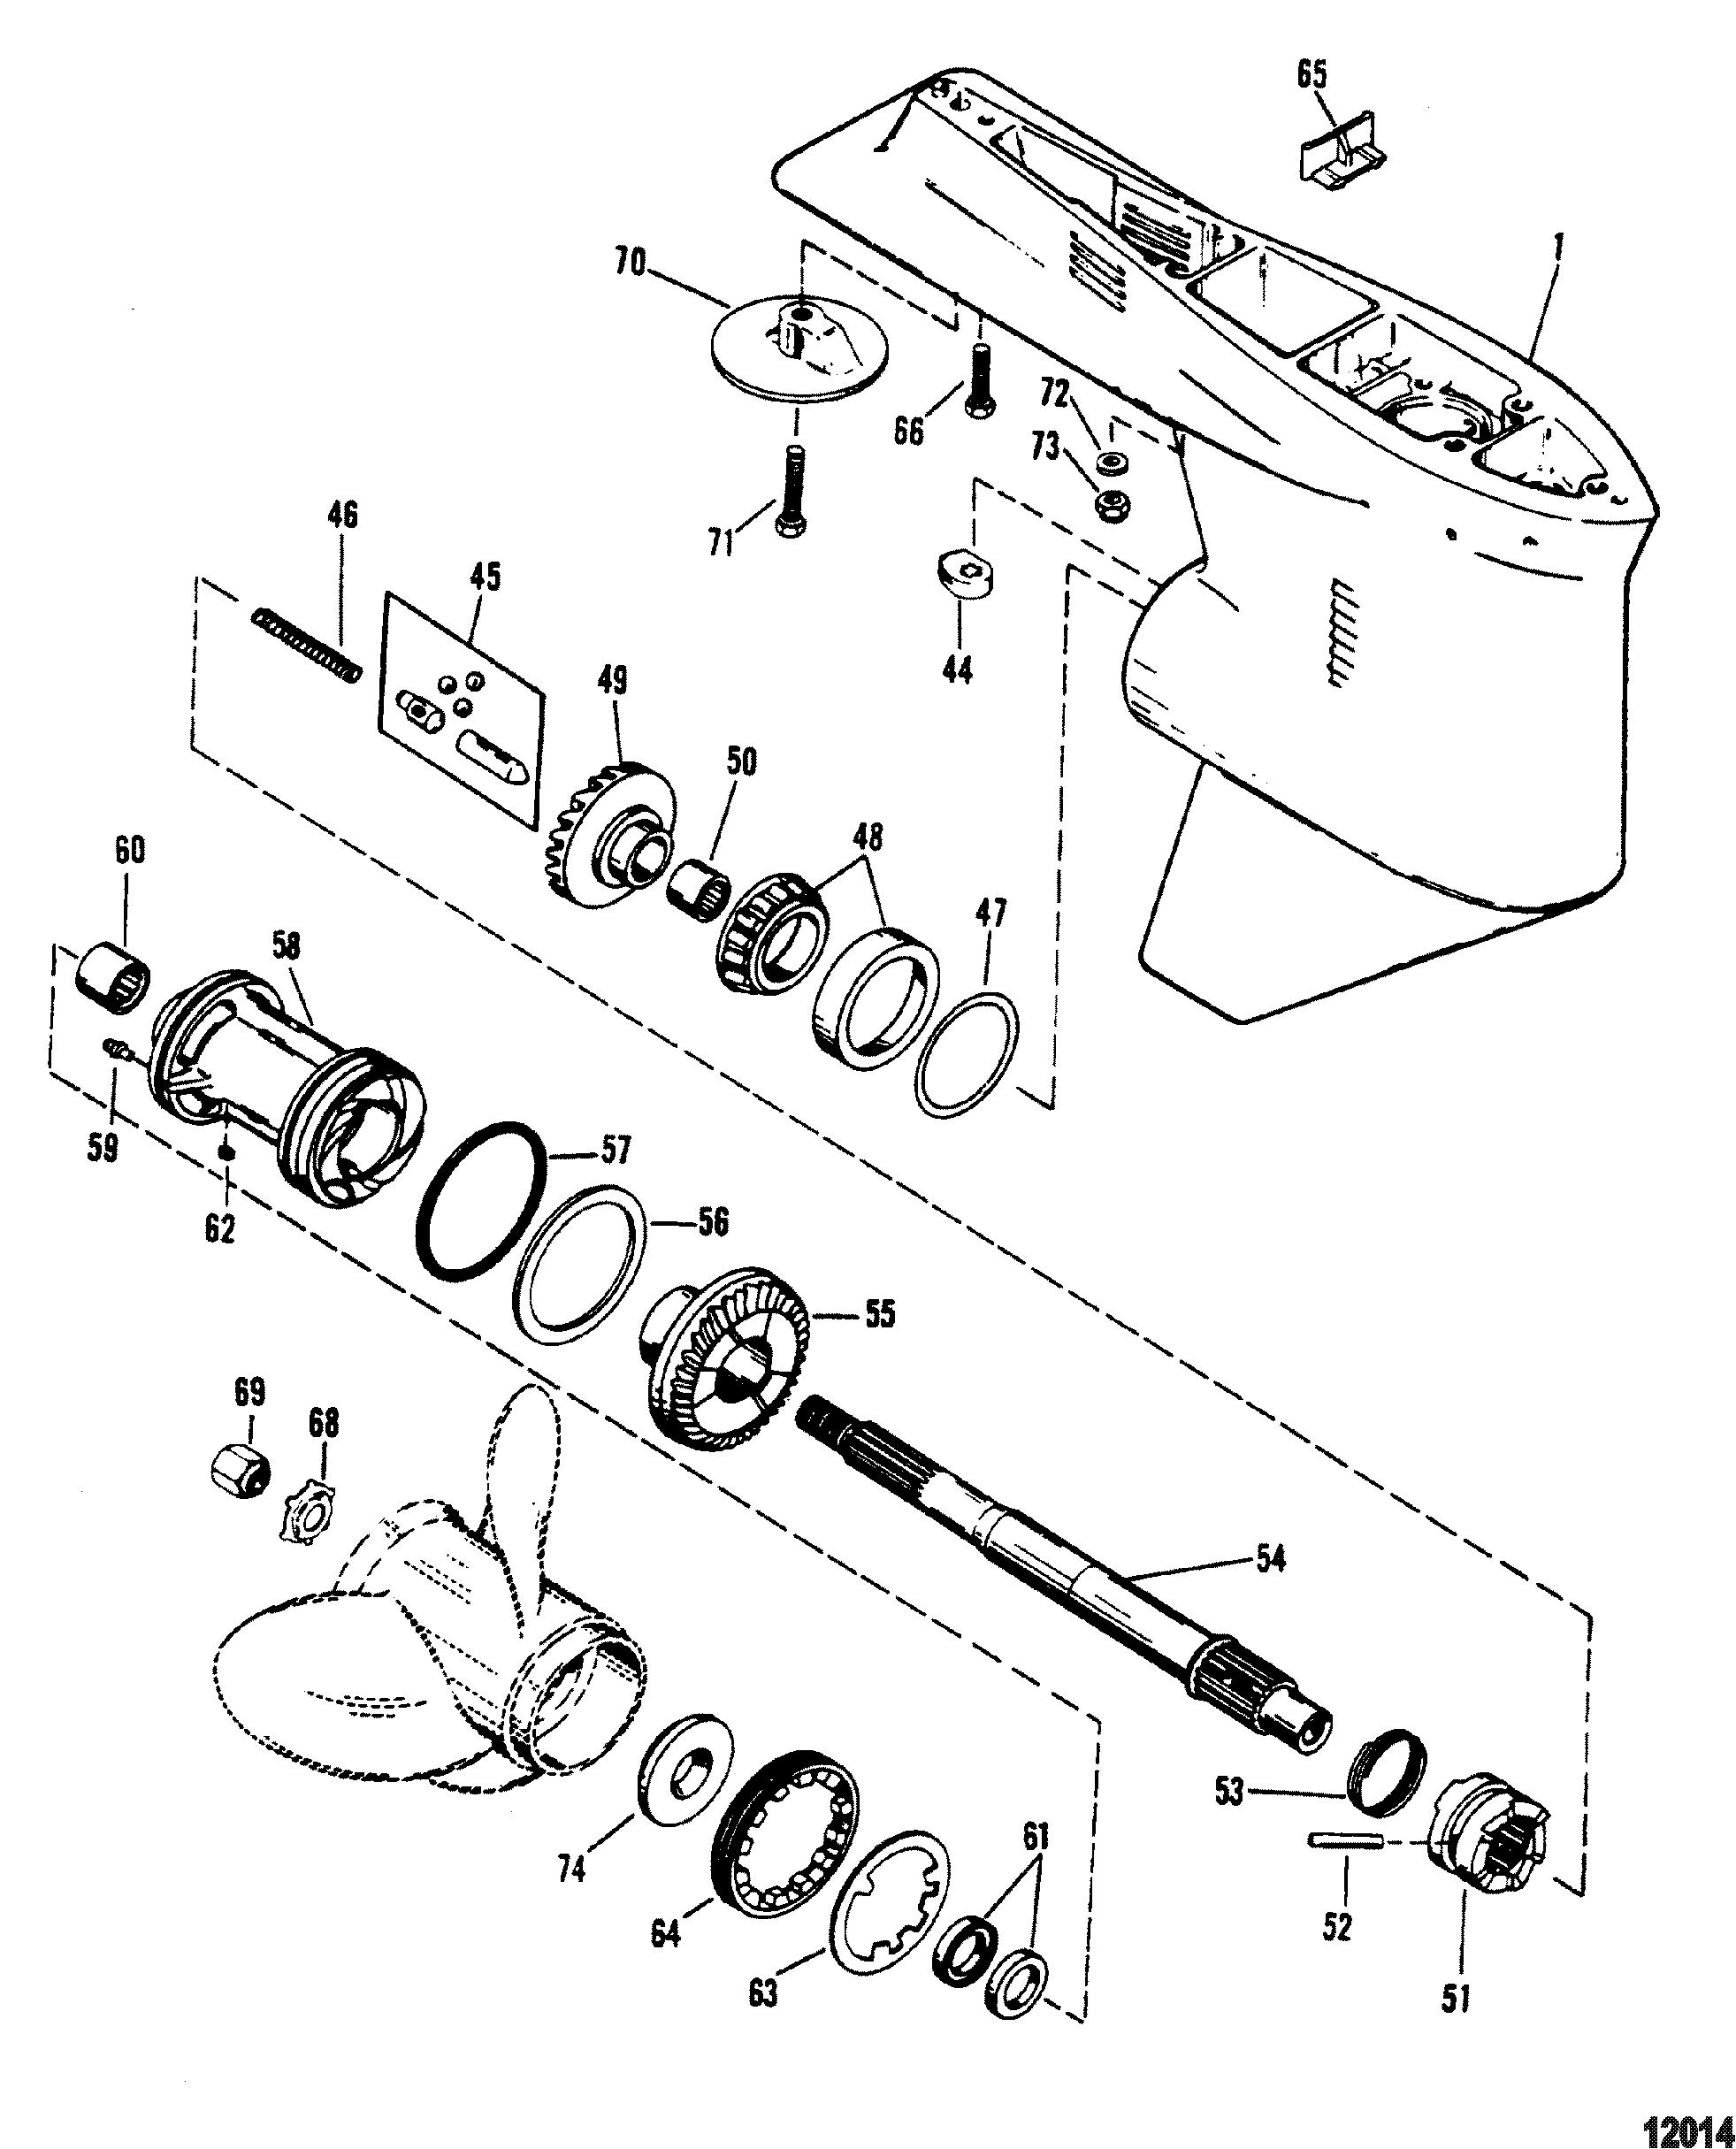 Gear Housing Prop Shaft 1.78:1 Gear Ratio 4.25 Torpedo Dia